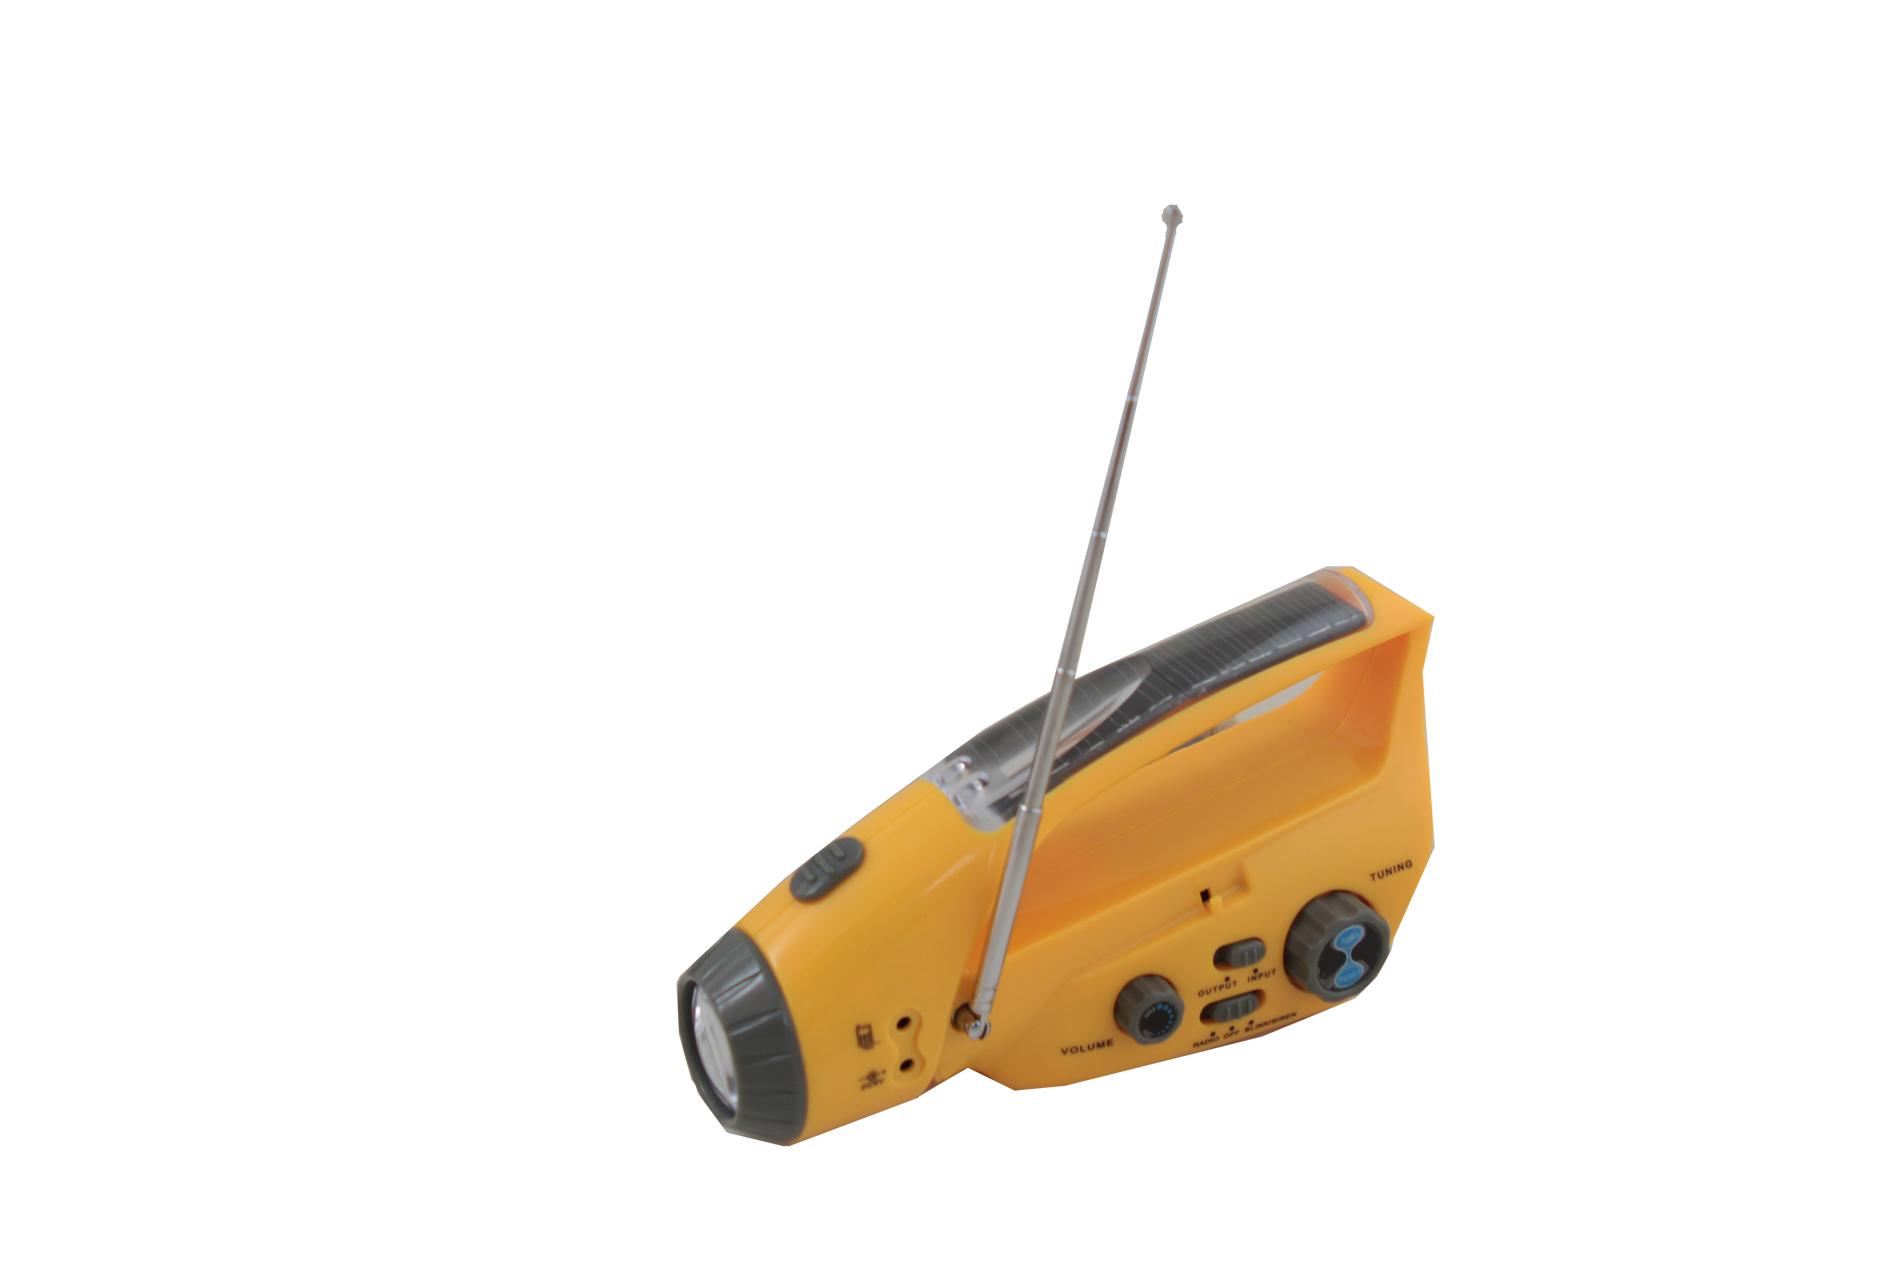 Wind-Up-Dynamo-Solar-Flashlight-Charger-FM-Radio thumbnail 5